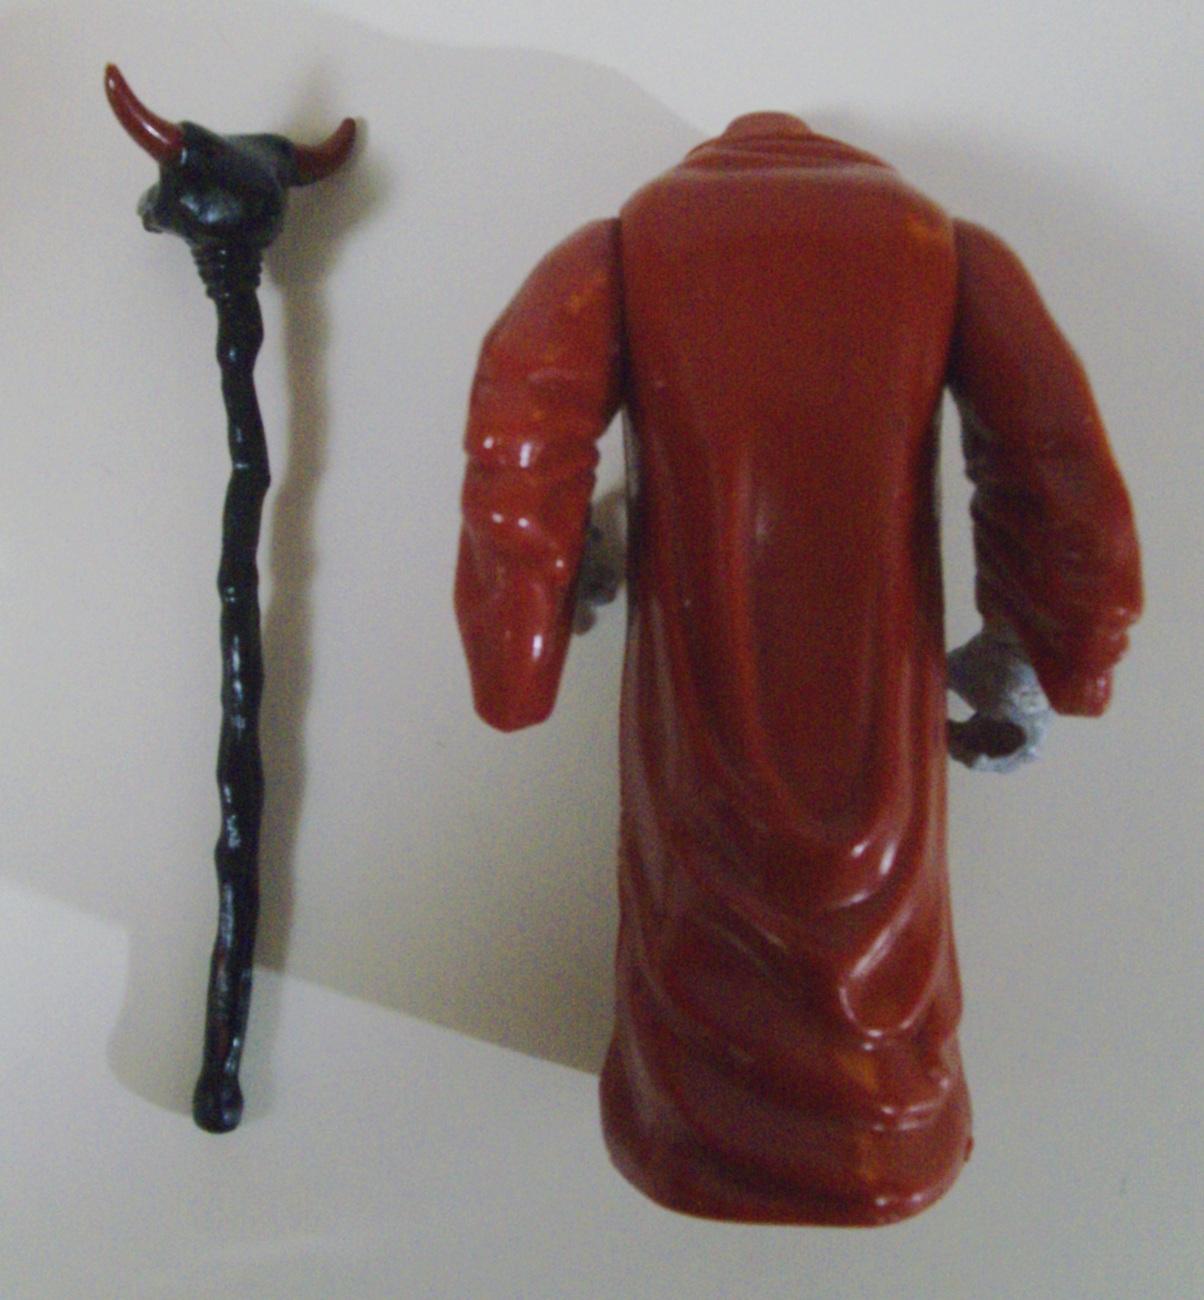 Thundercats LJN Vintage 1985 Mail-Away Mumm Ra mumy - 100% Complete